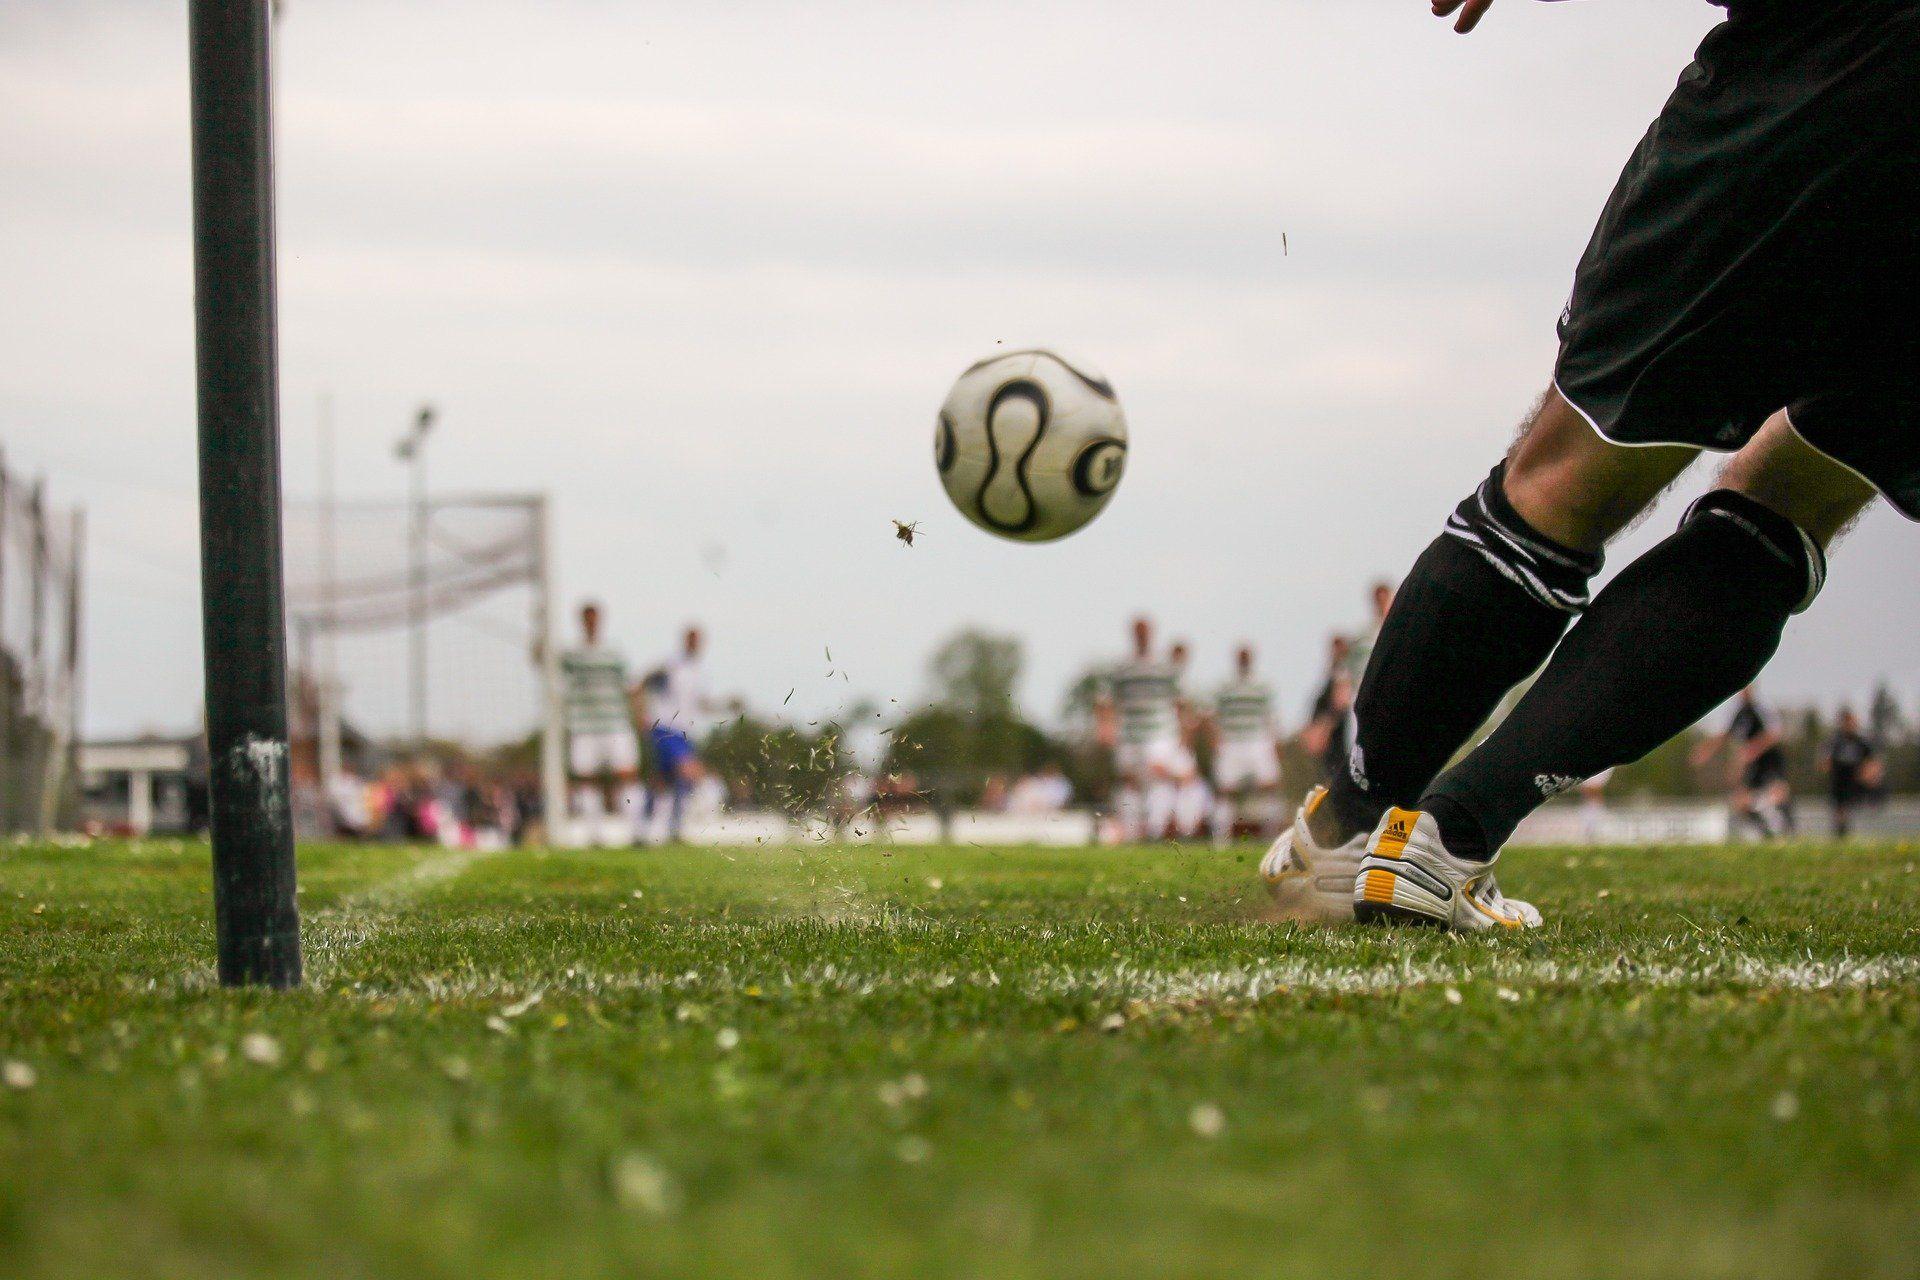 goalkeeper in a football net